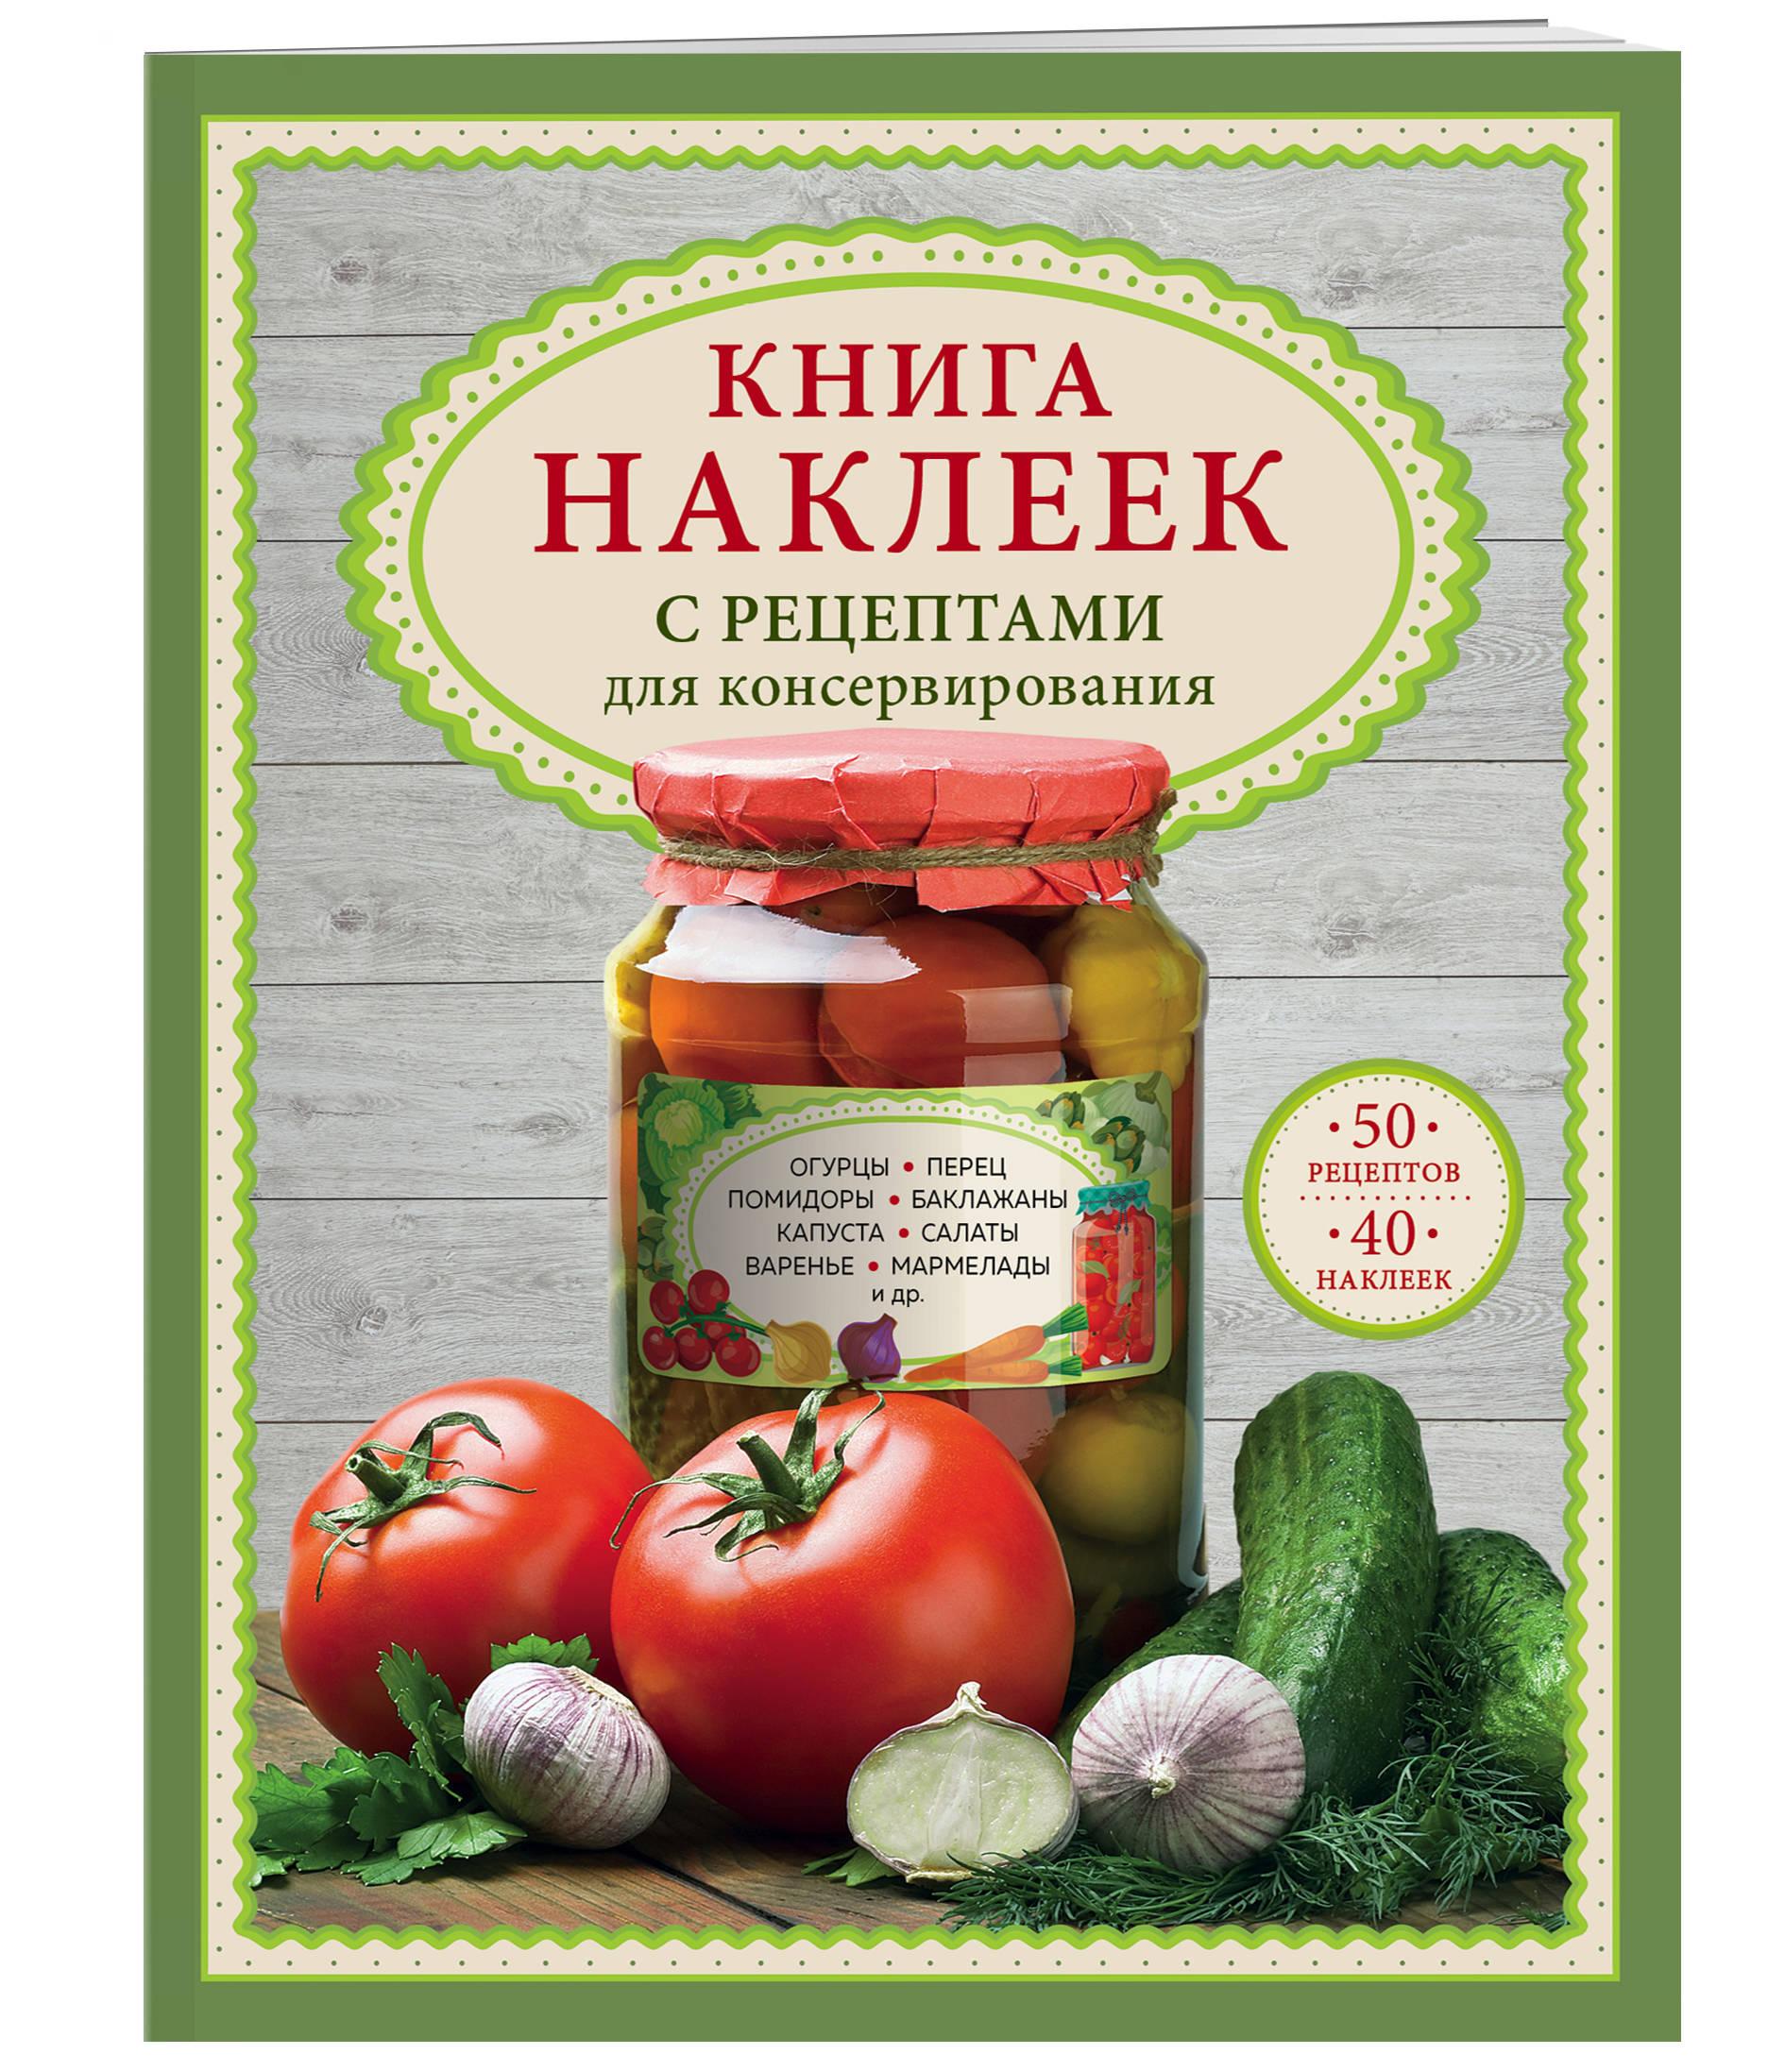 Михайлова И.А. Книга наклеек с рецептами для консервирования